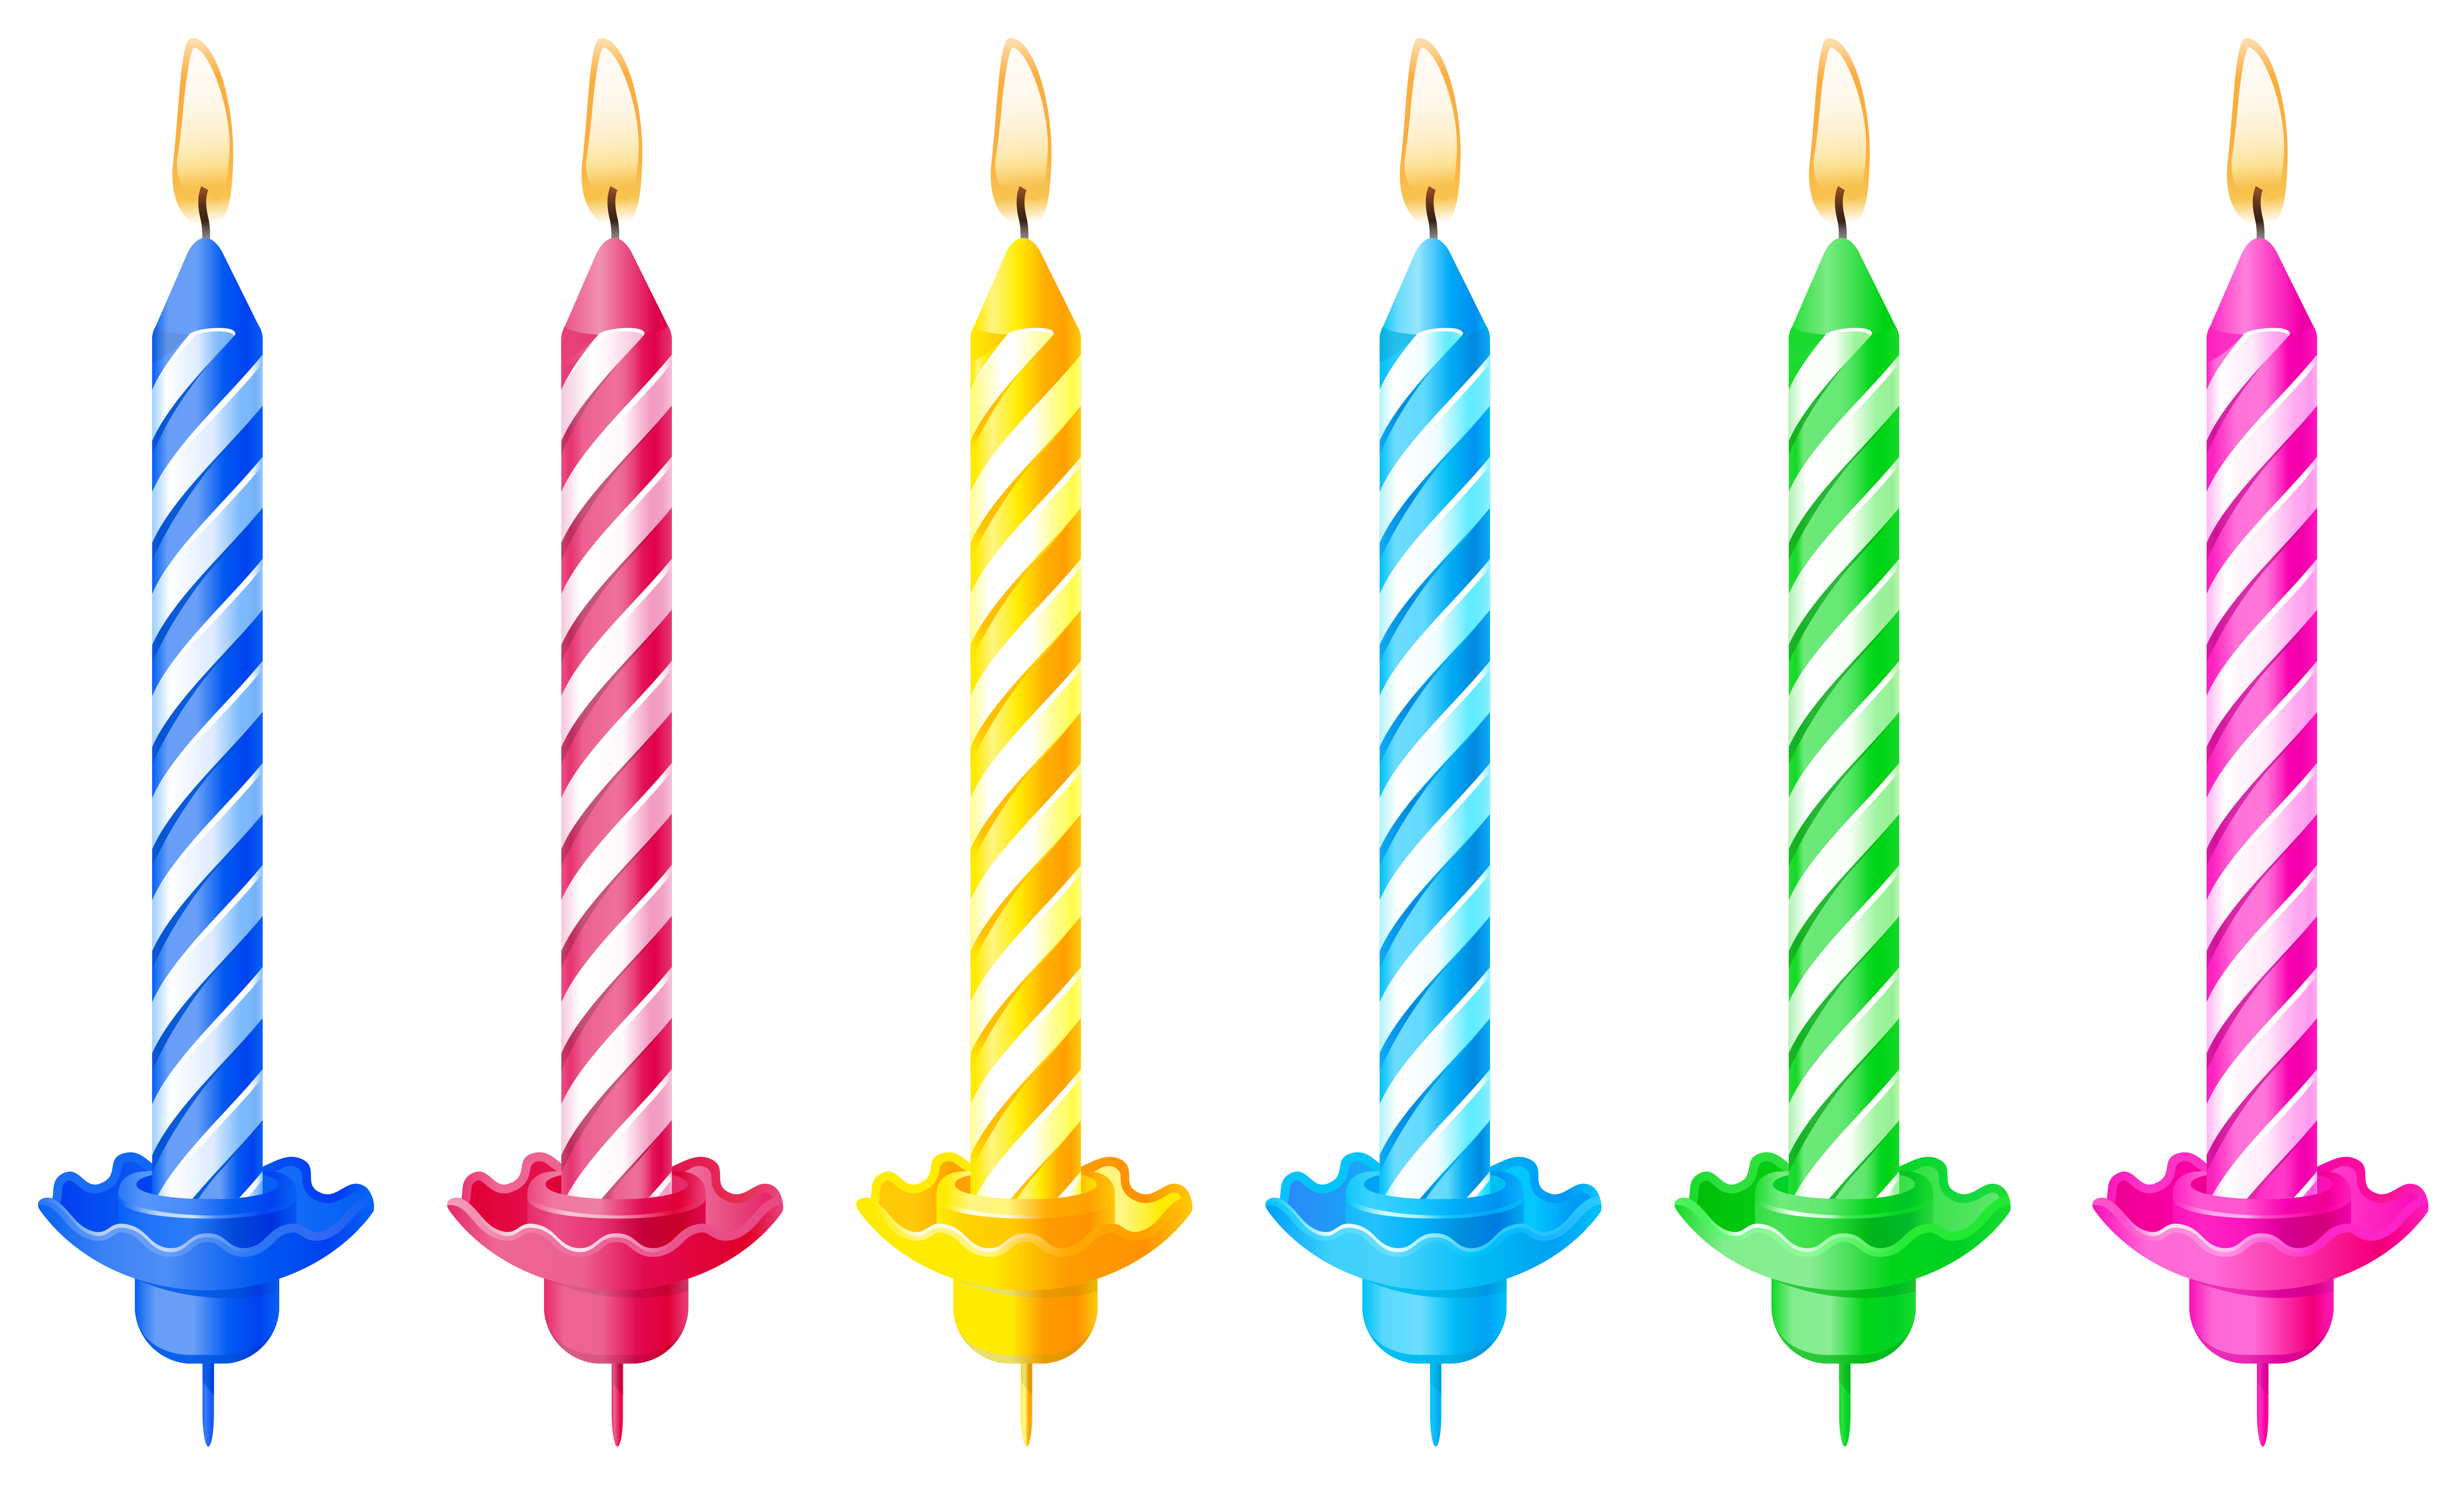 Birthday Candle Clipart U0026amp; Birthd-Birthday Candle Clipart u0026amp; Birthday Candle Clip Art Images .-0